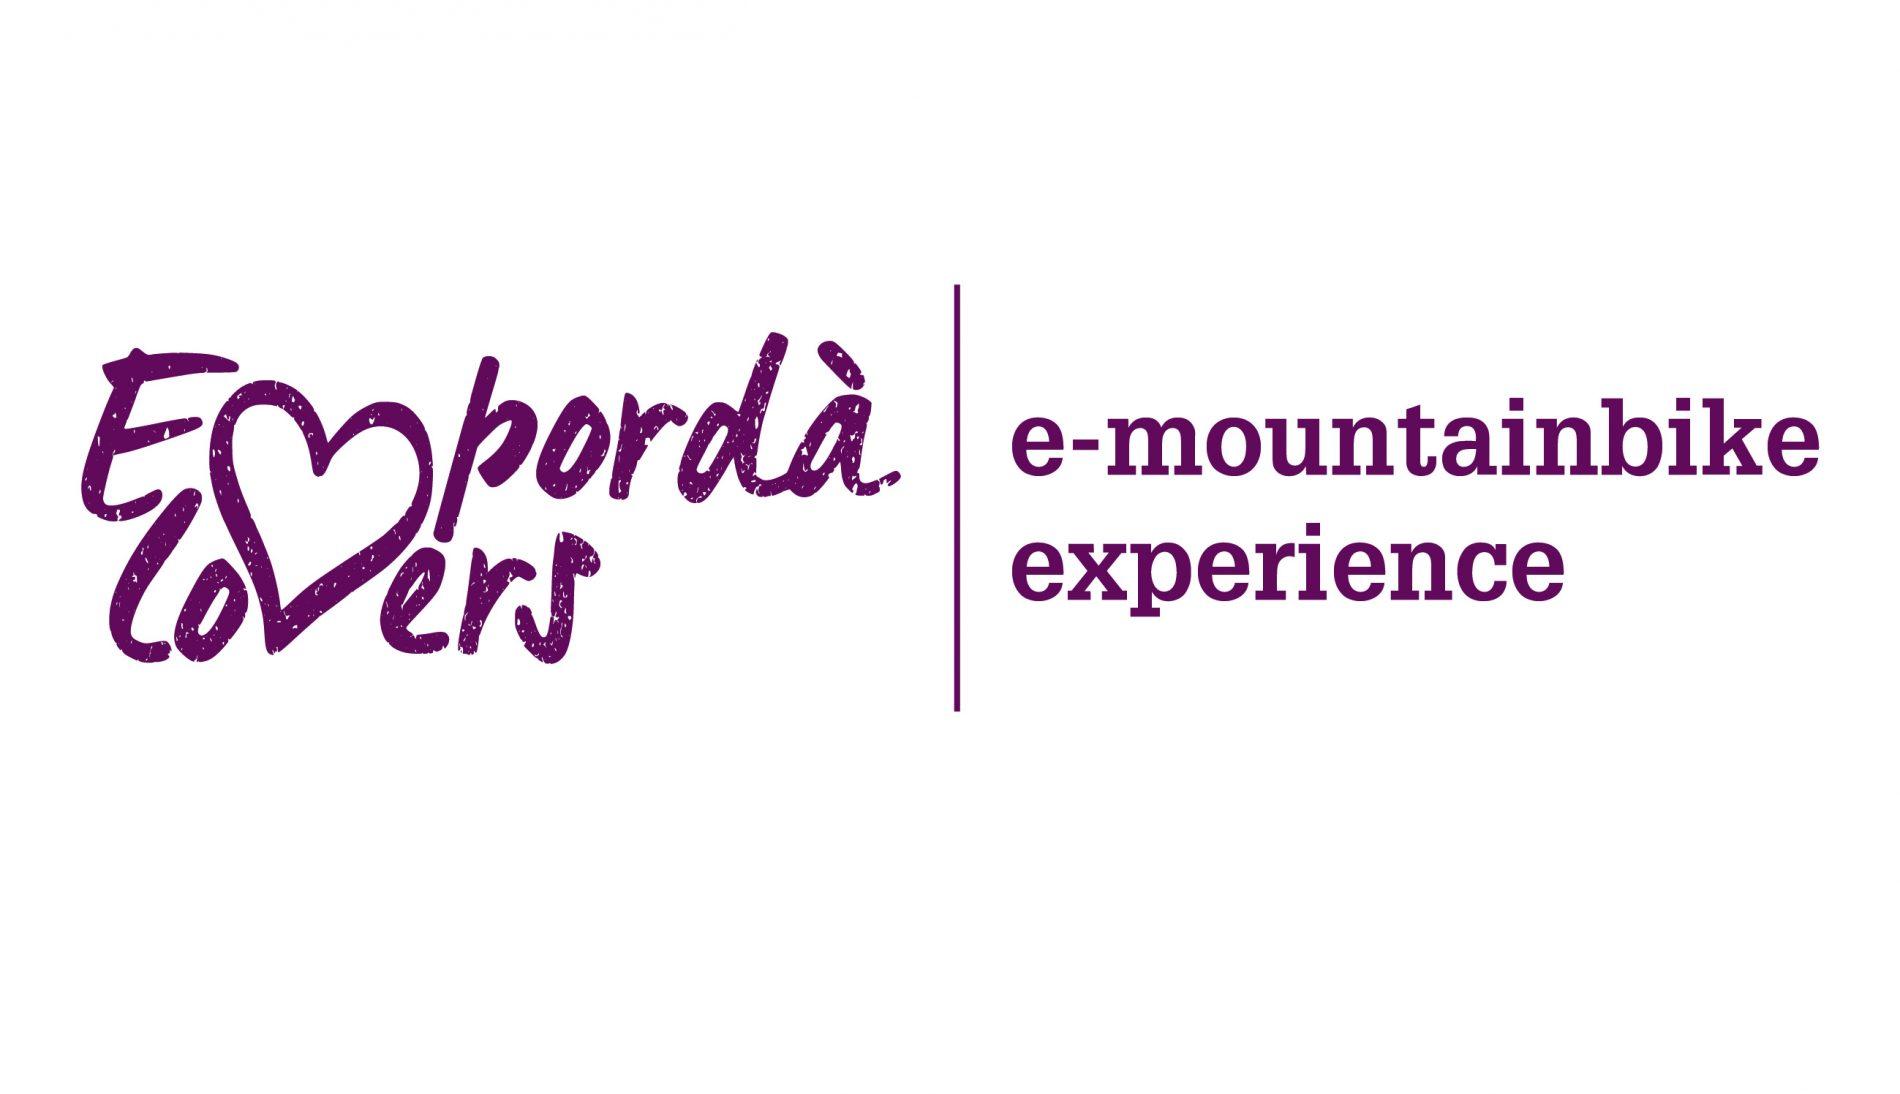 Logotipo Empordà Lovers